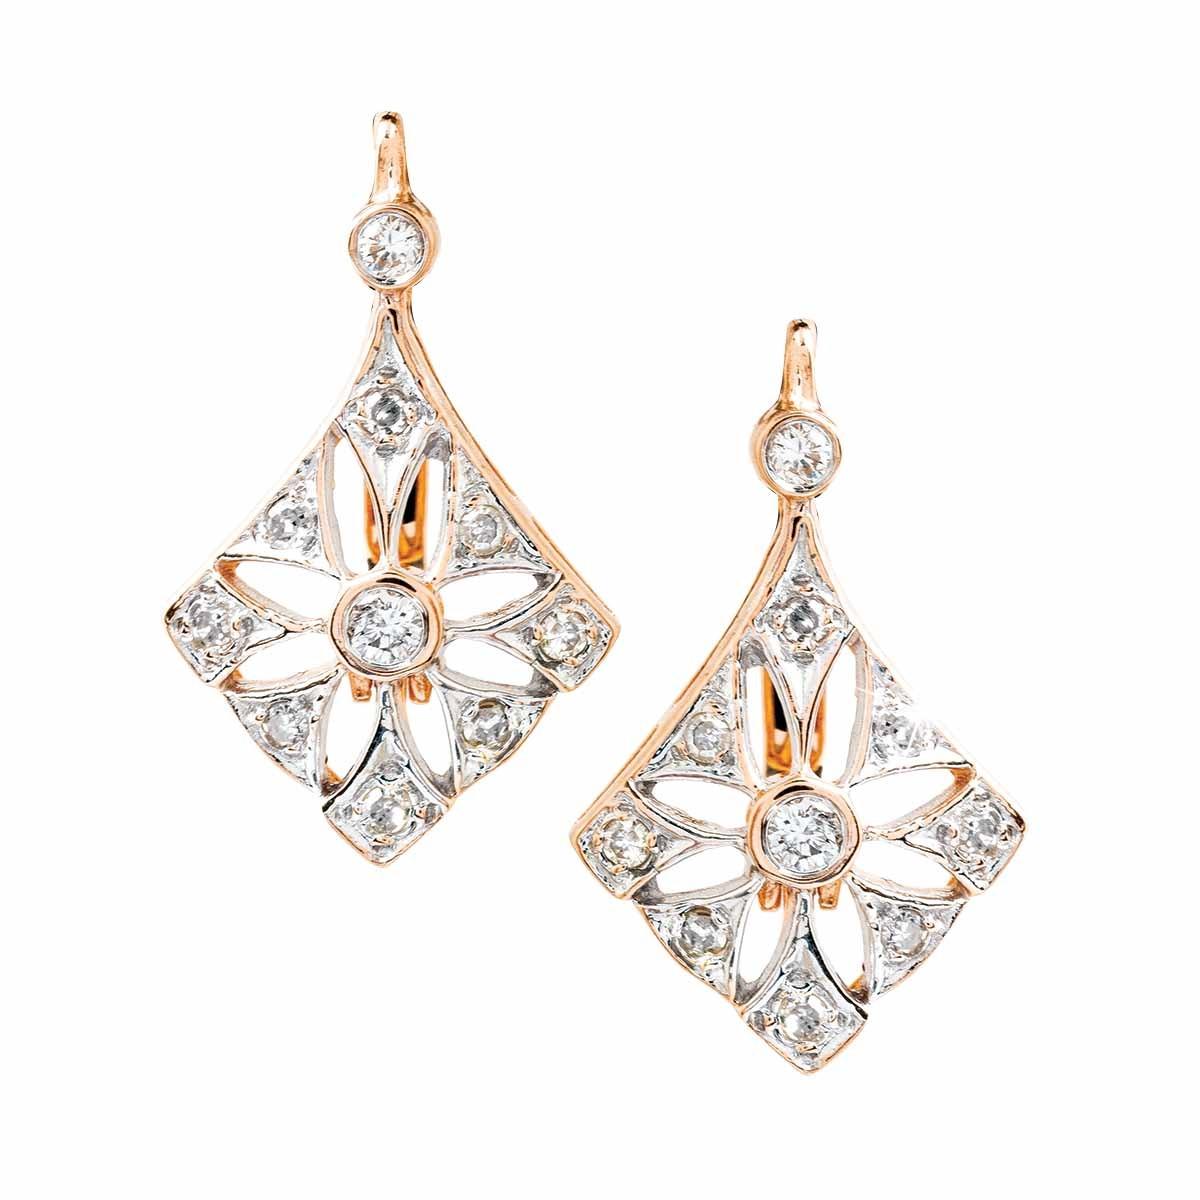 Vintage 0.46 CTW Diamond Kite Earrings